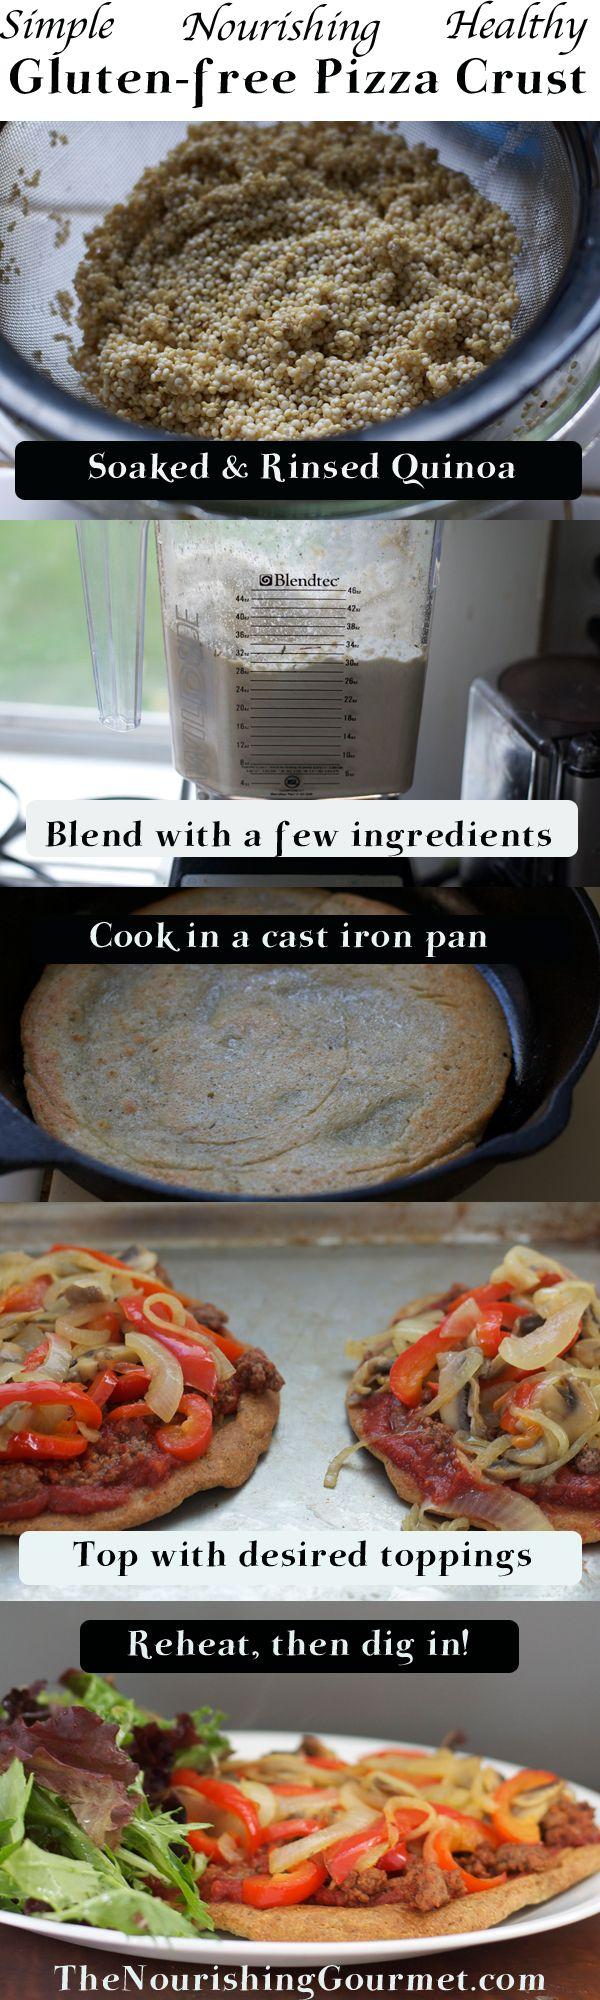 Quinoa Gluten-free Pizza crusts are so simple to make and delicious!